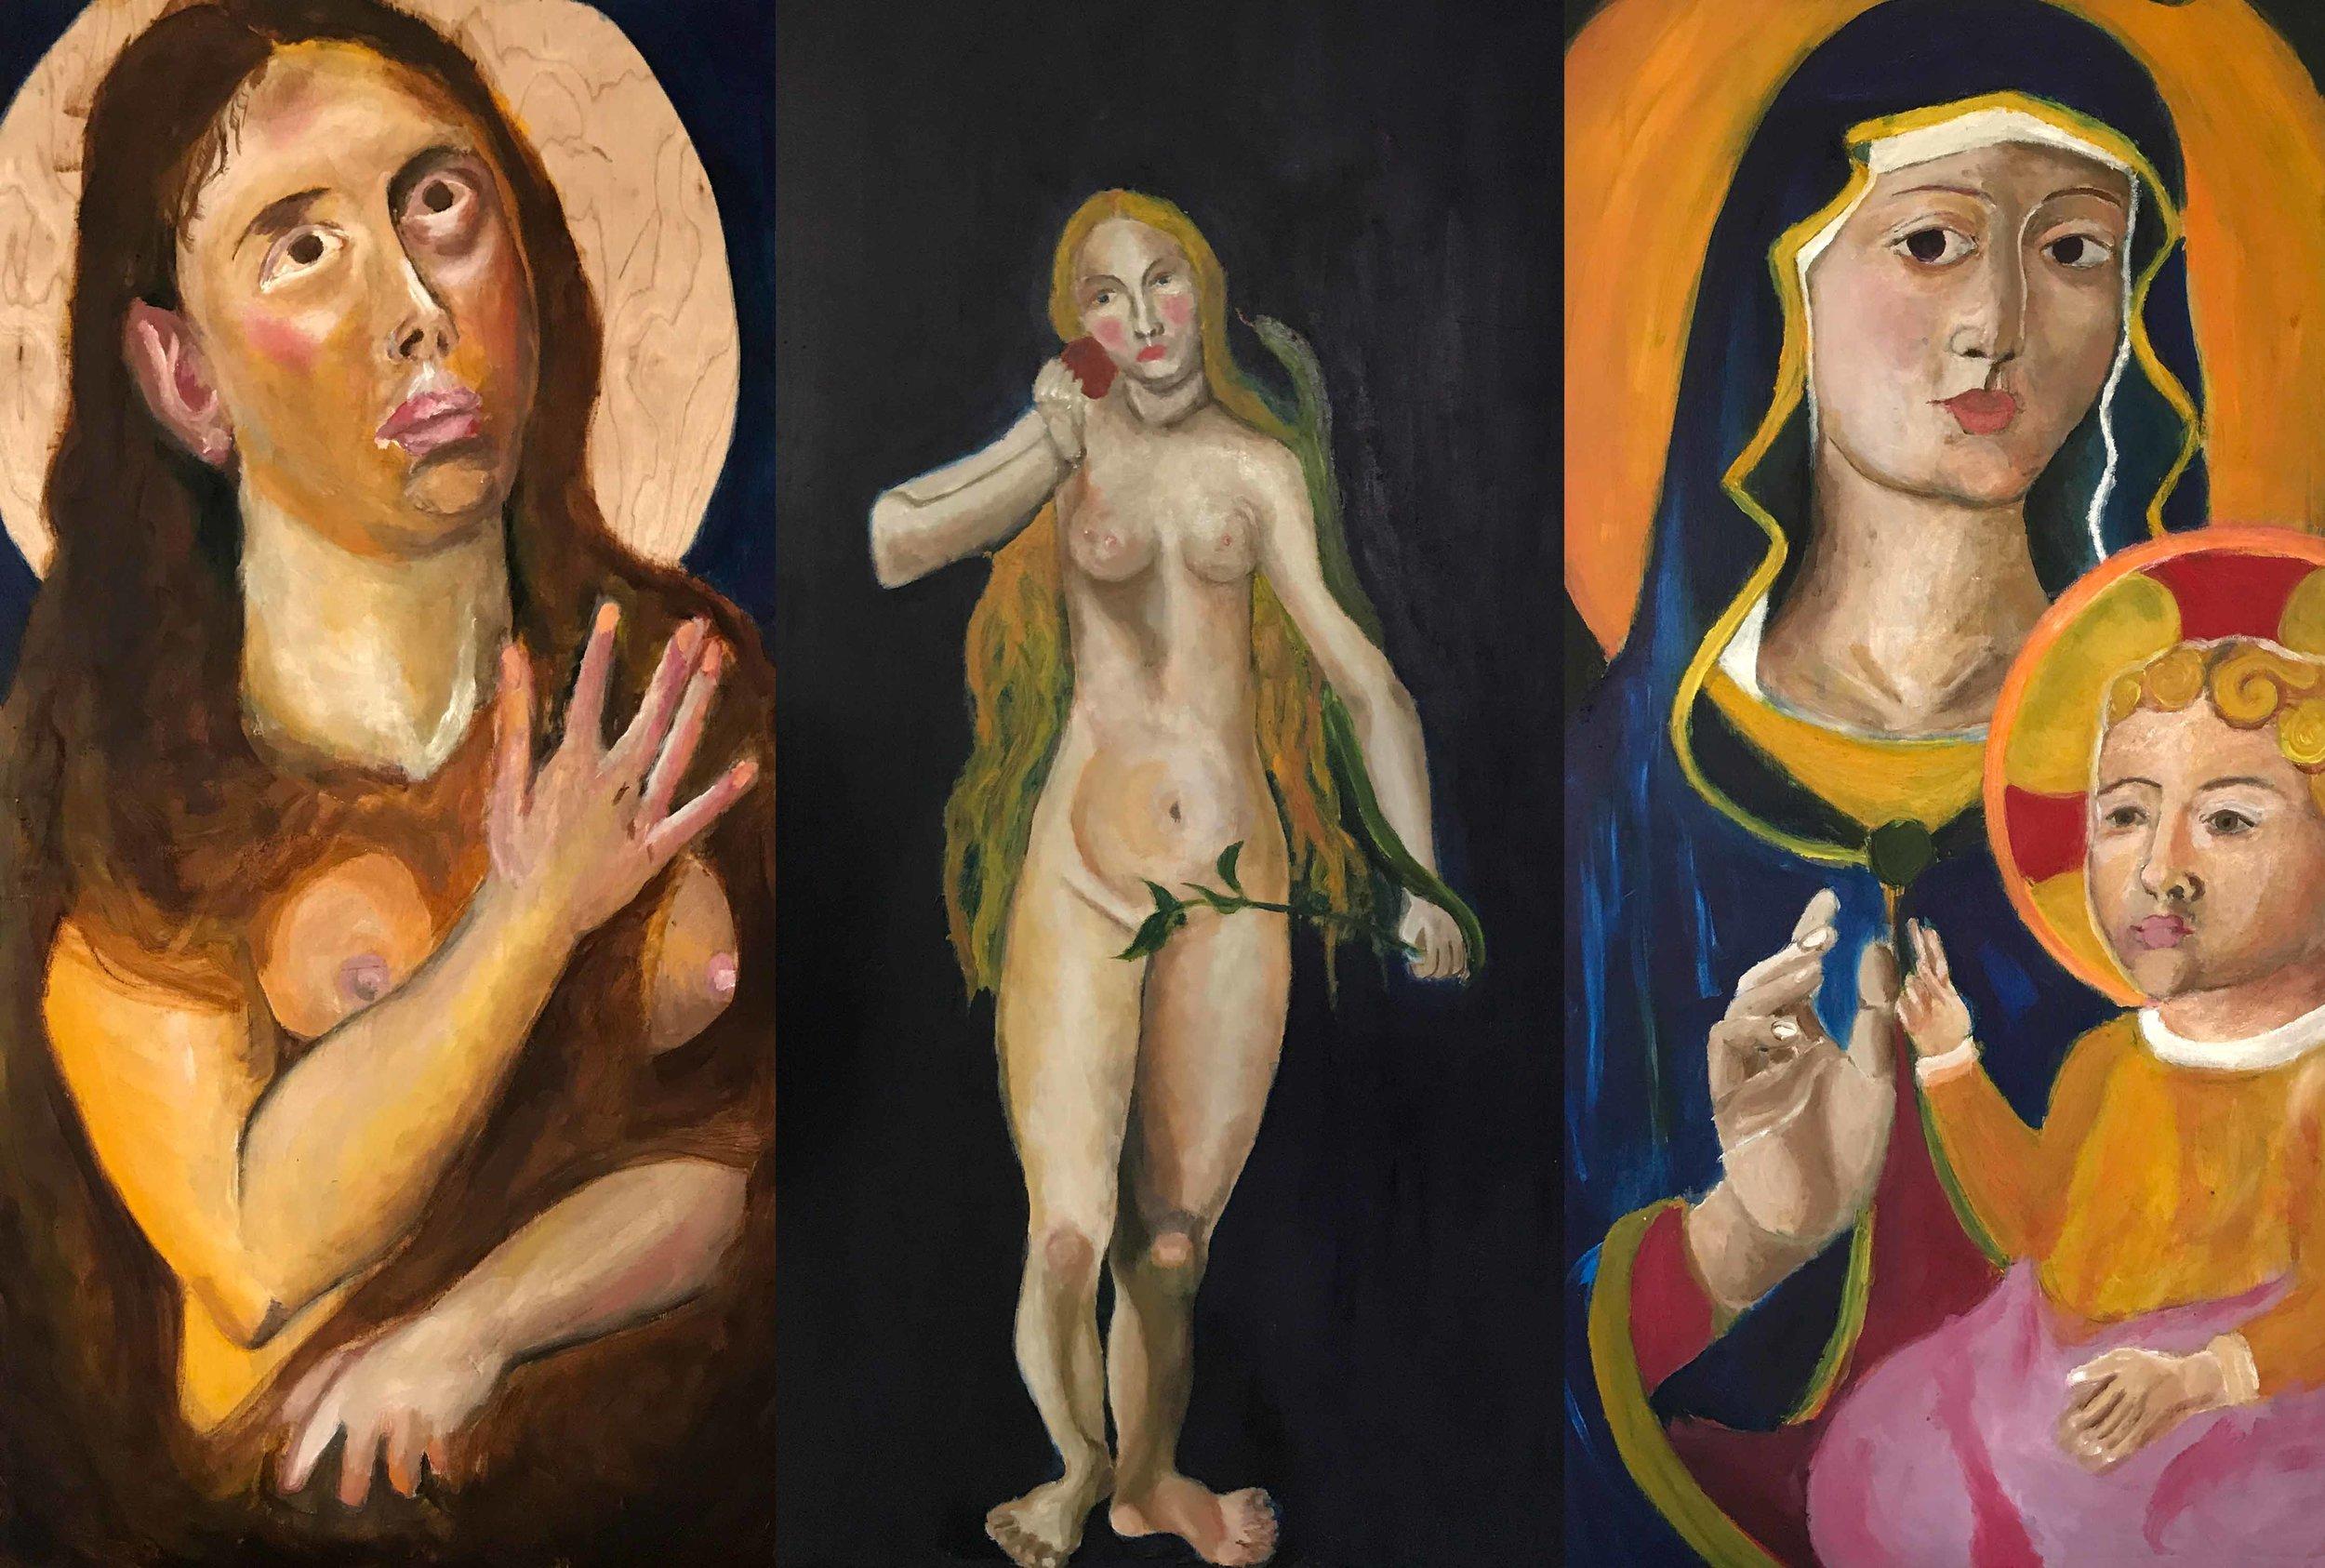 Triptych: Mary, Eve, & The Virgin